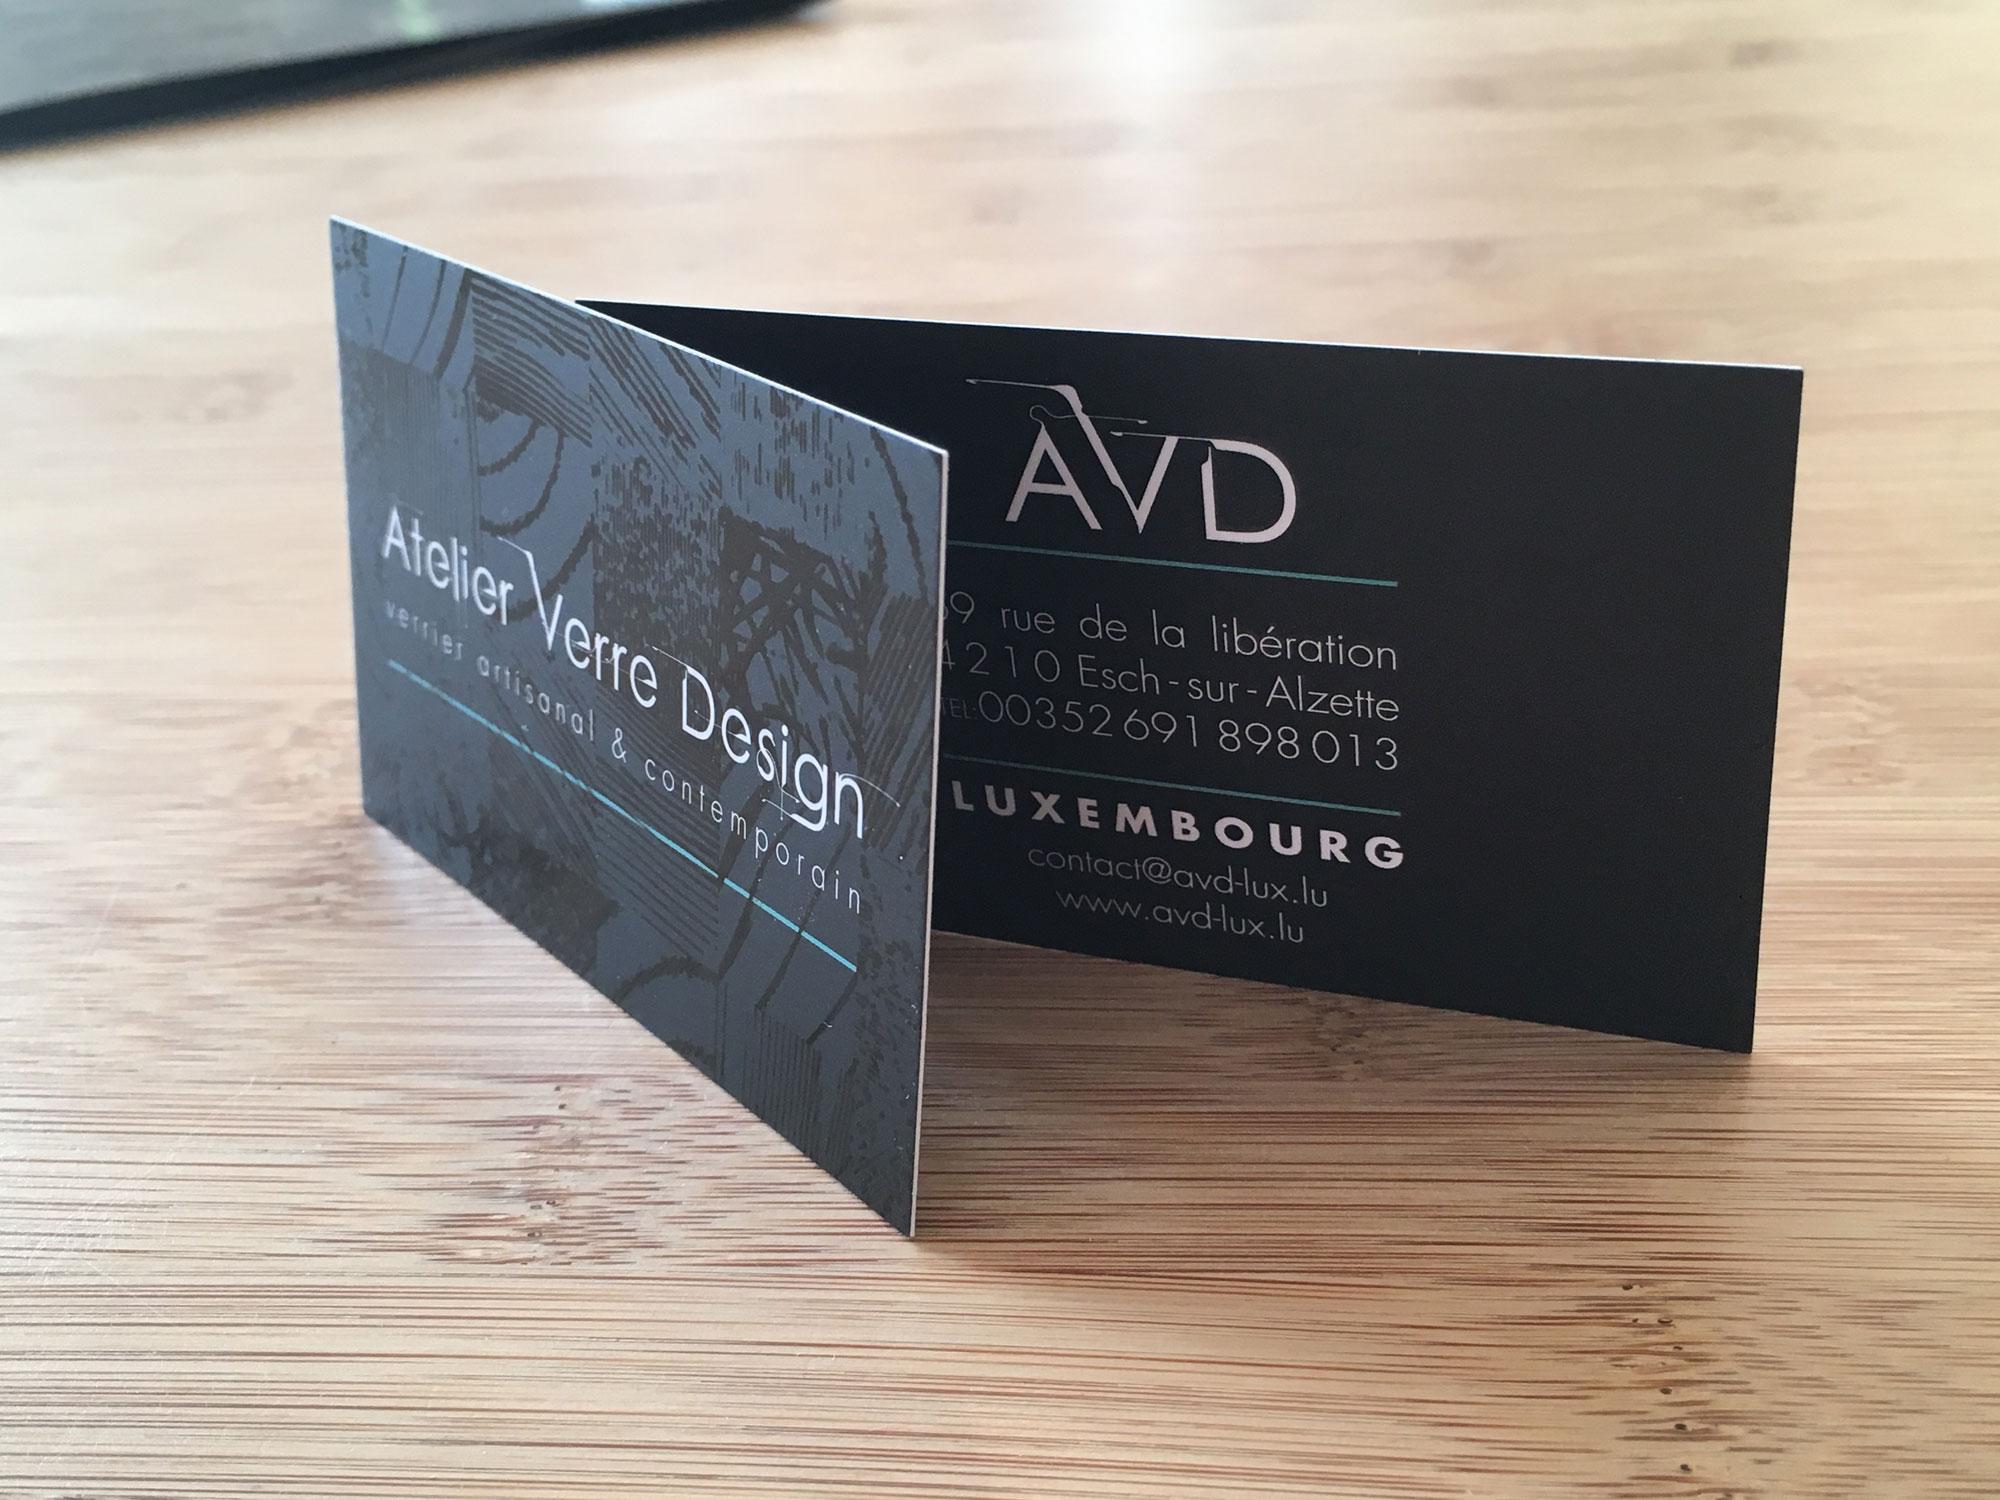 ATELIER VERRE DESIGN / Verrier artisanal & contemporain